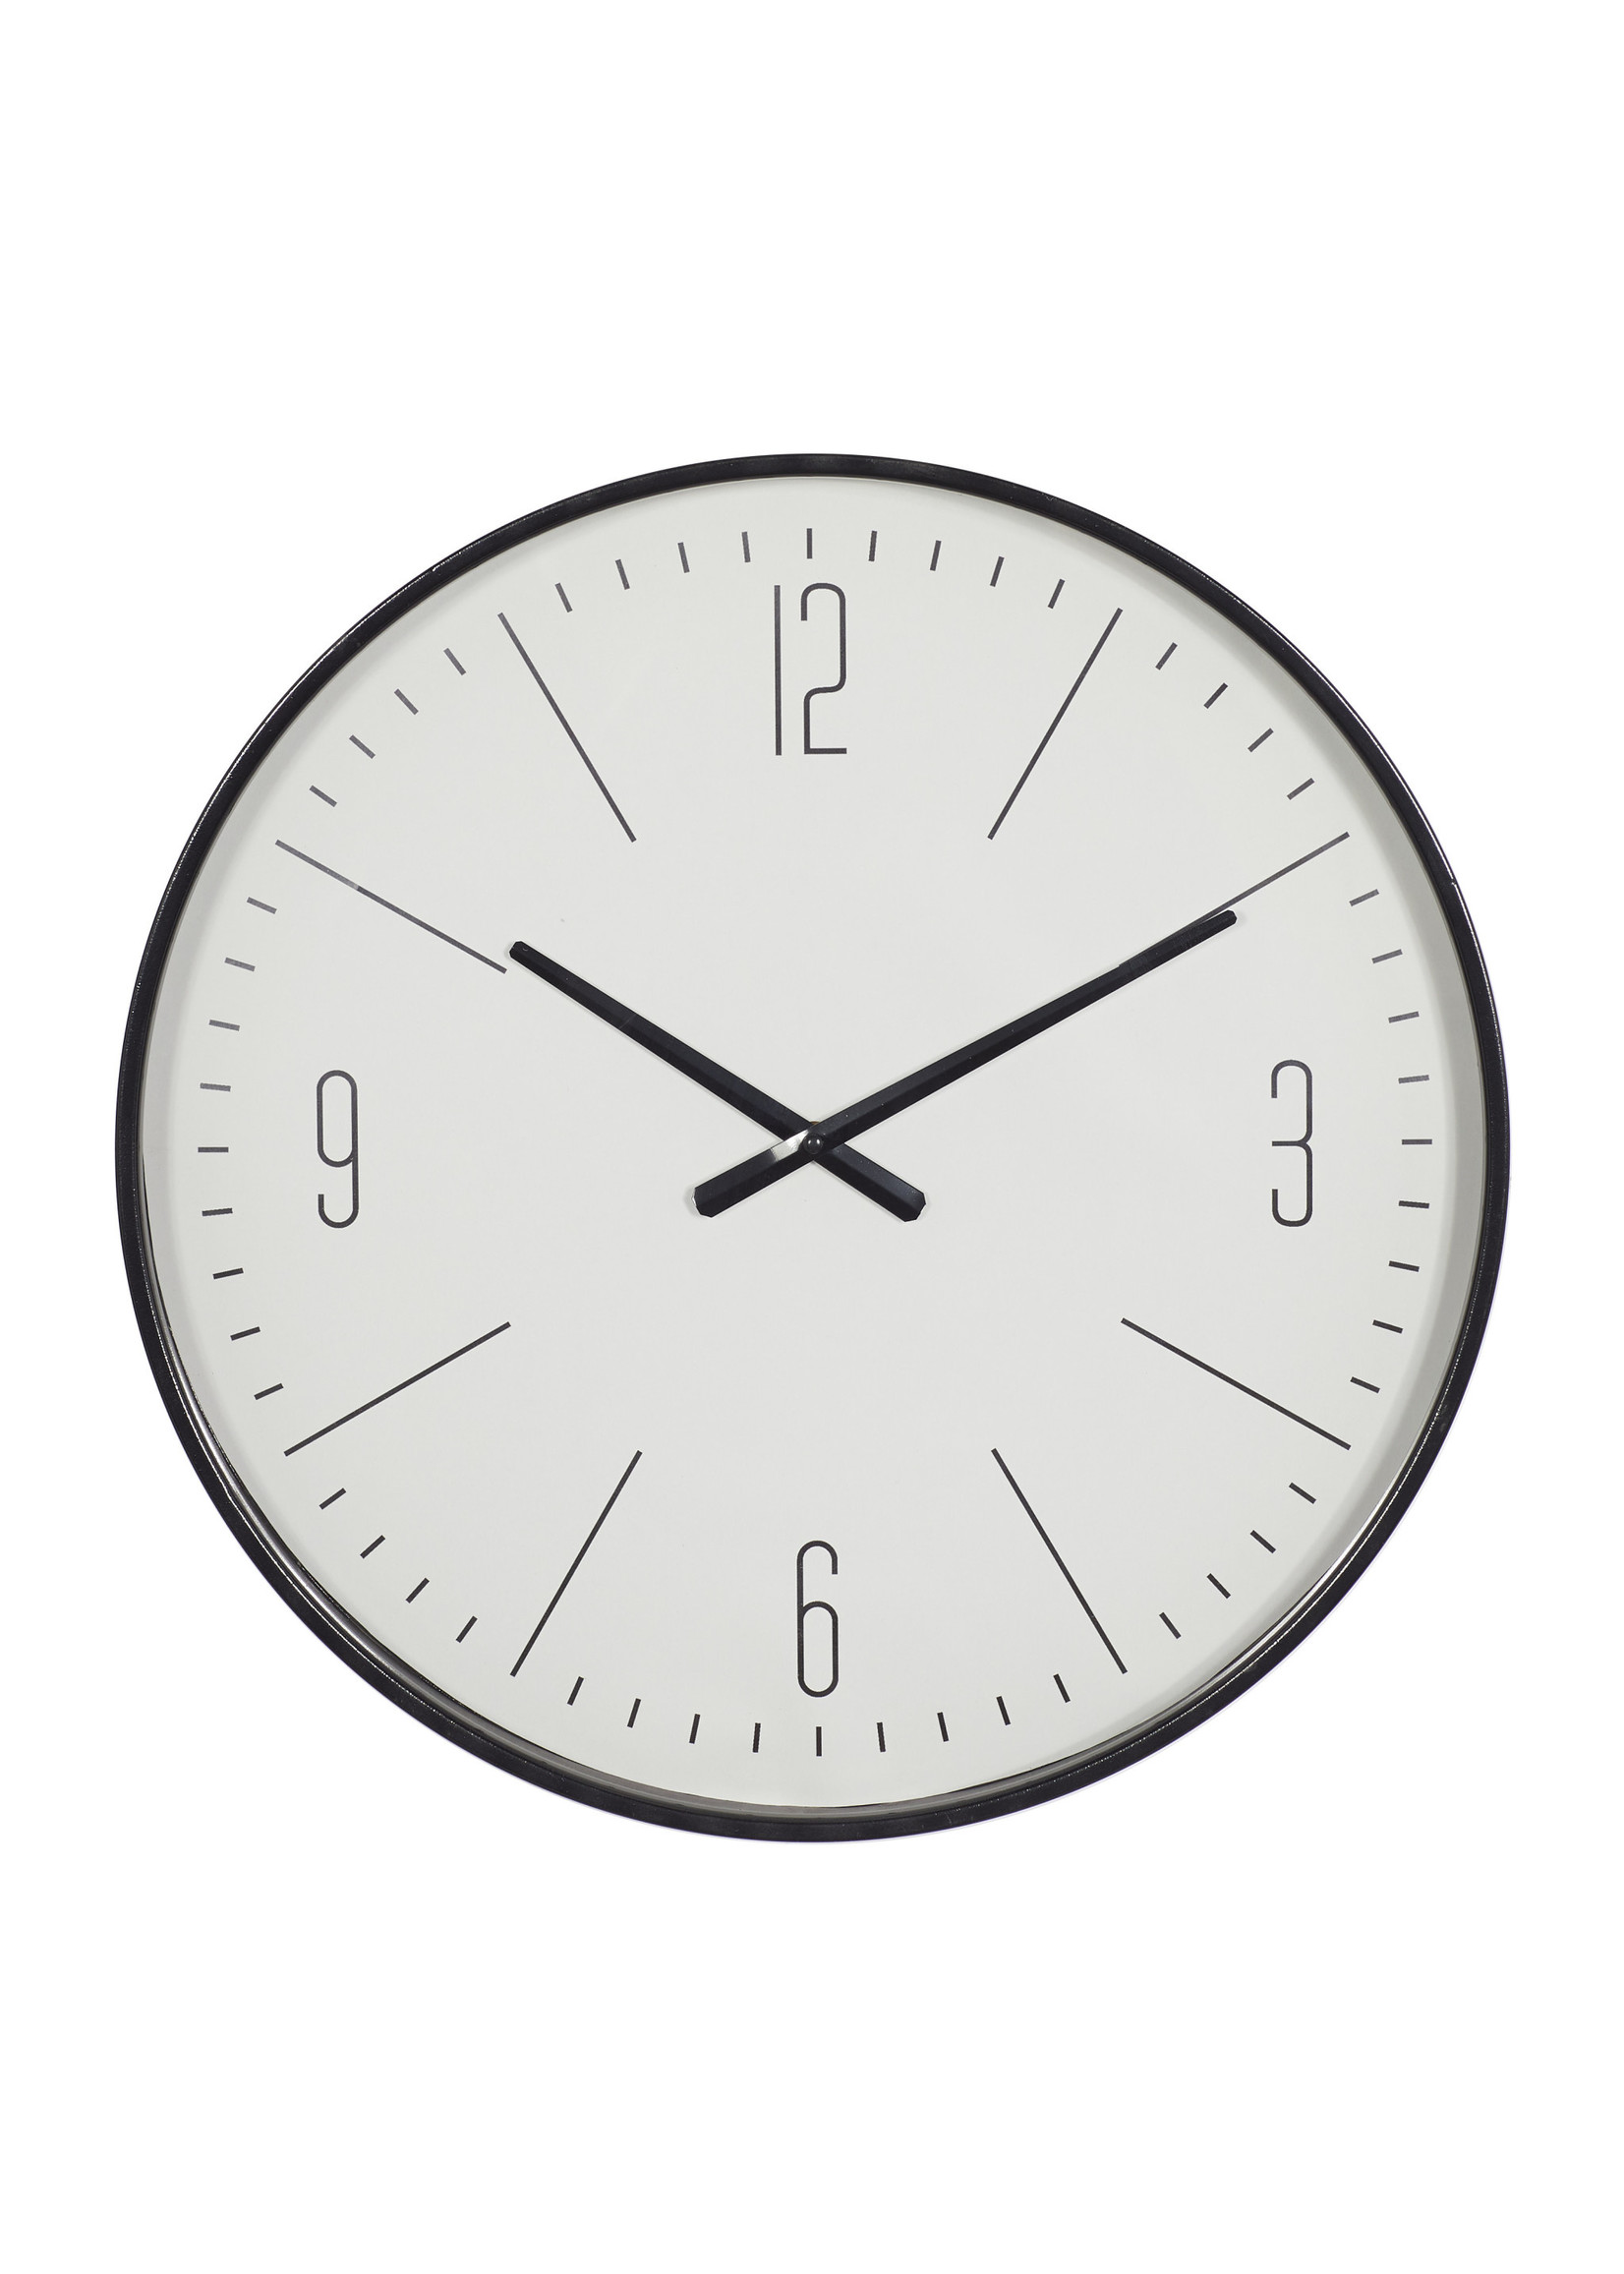 UMA Enterprises Metal Wall Clock  - Black